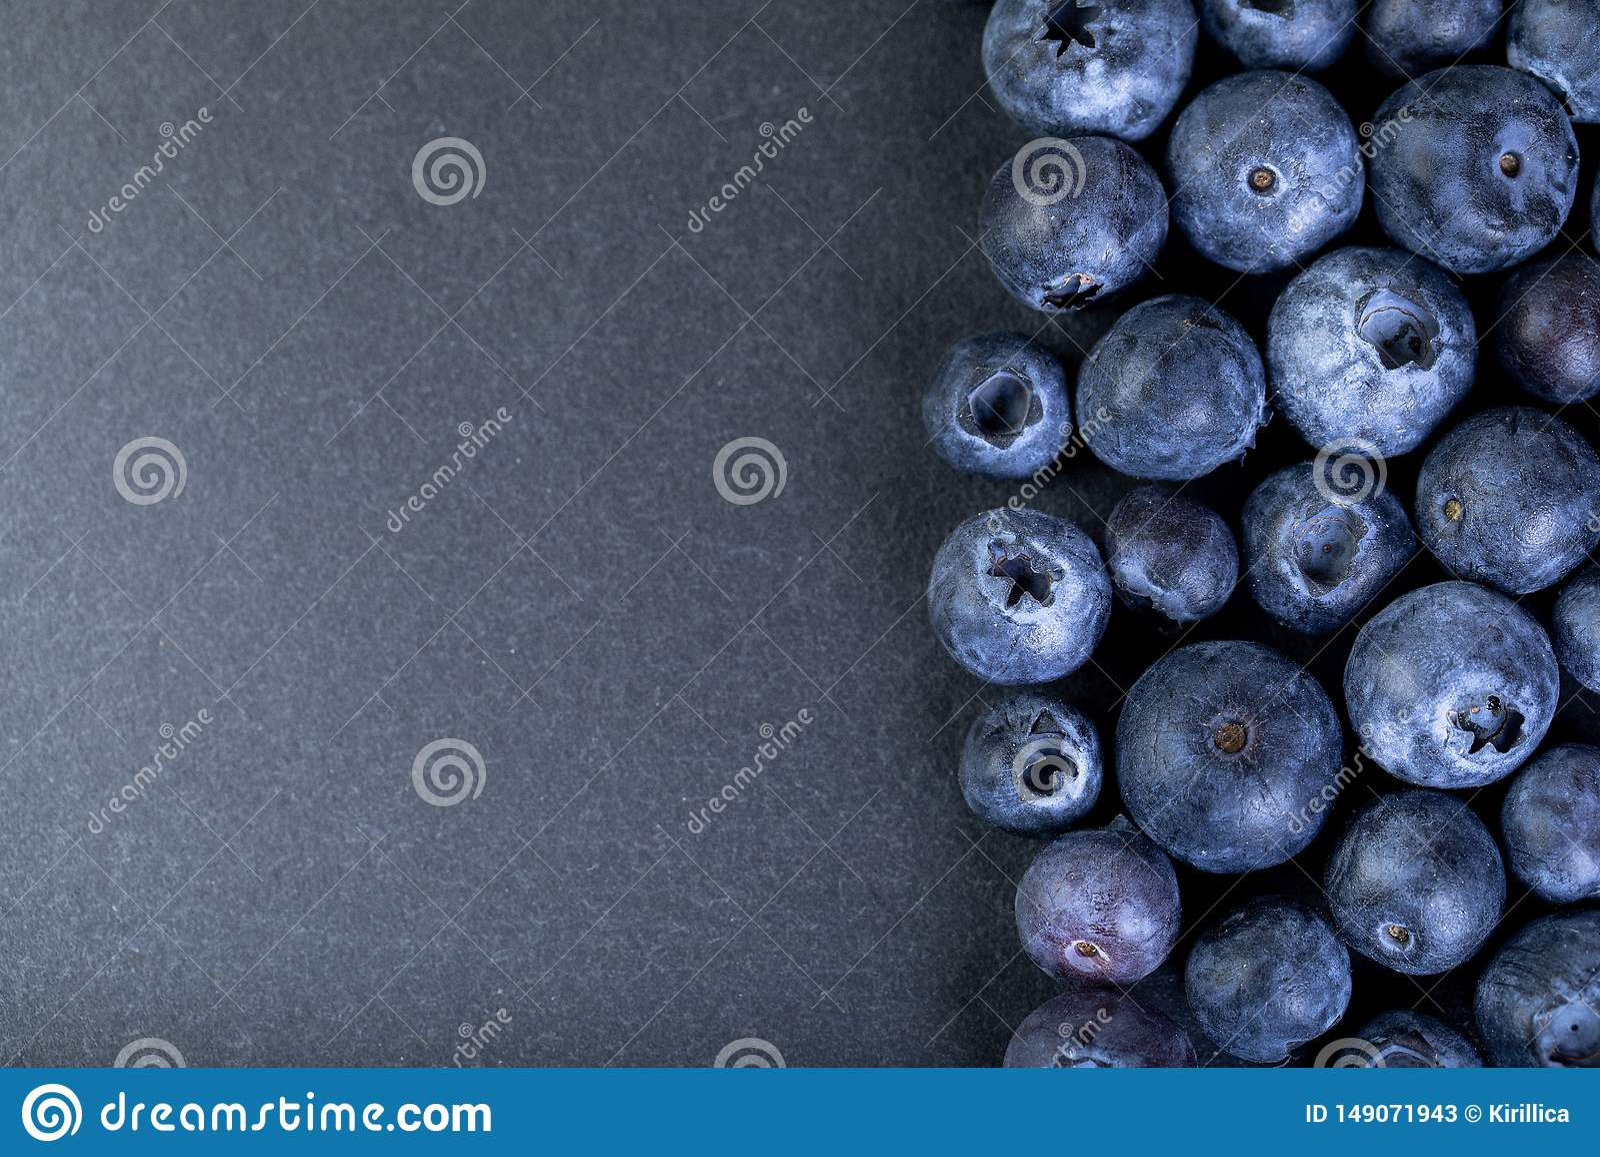 Blueberries on black stone board